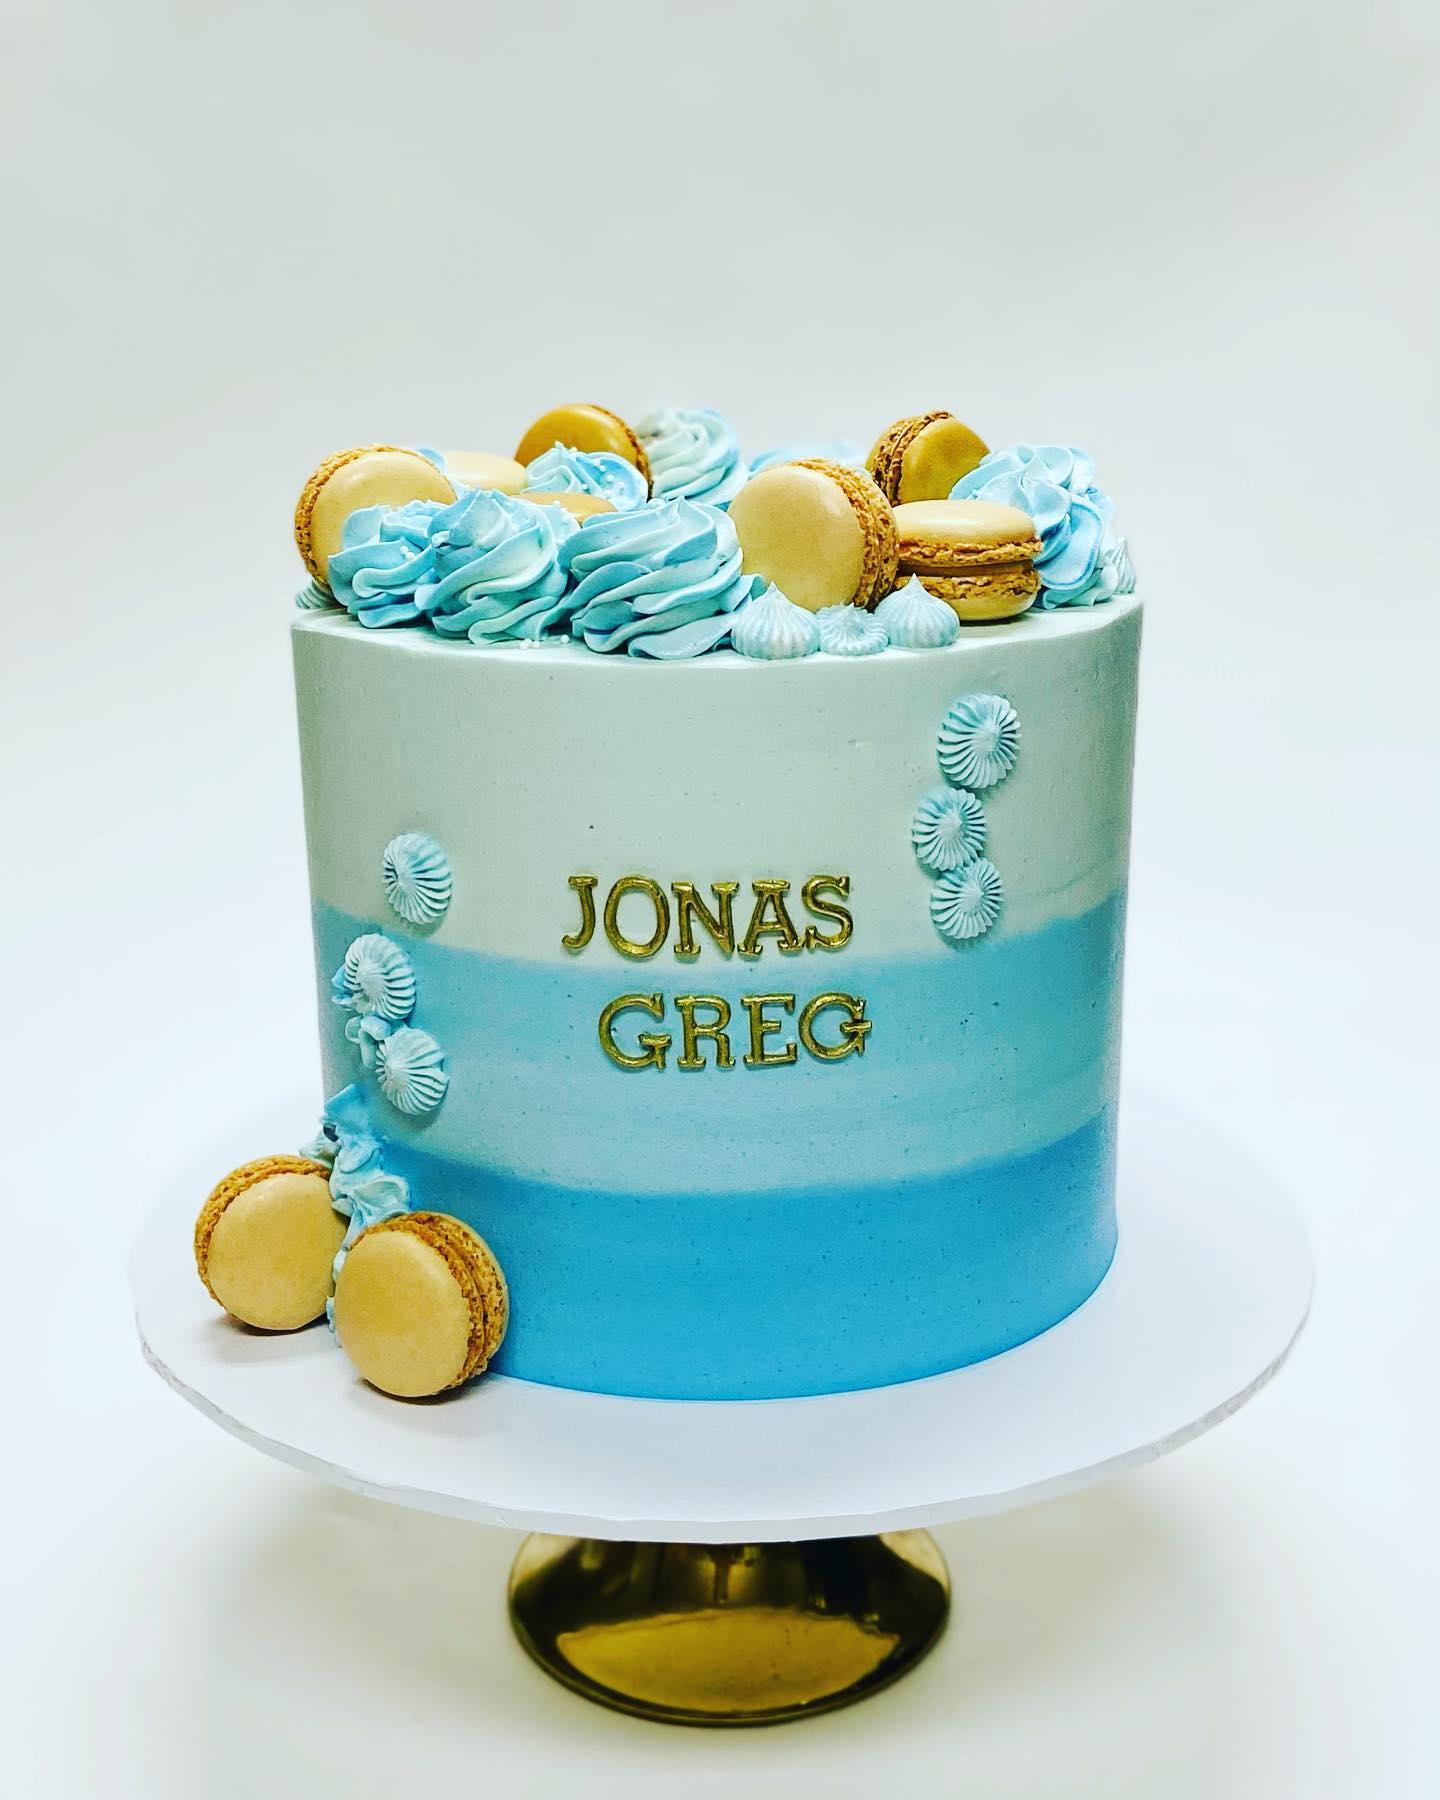 Jonas Greg